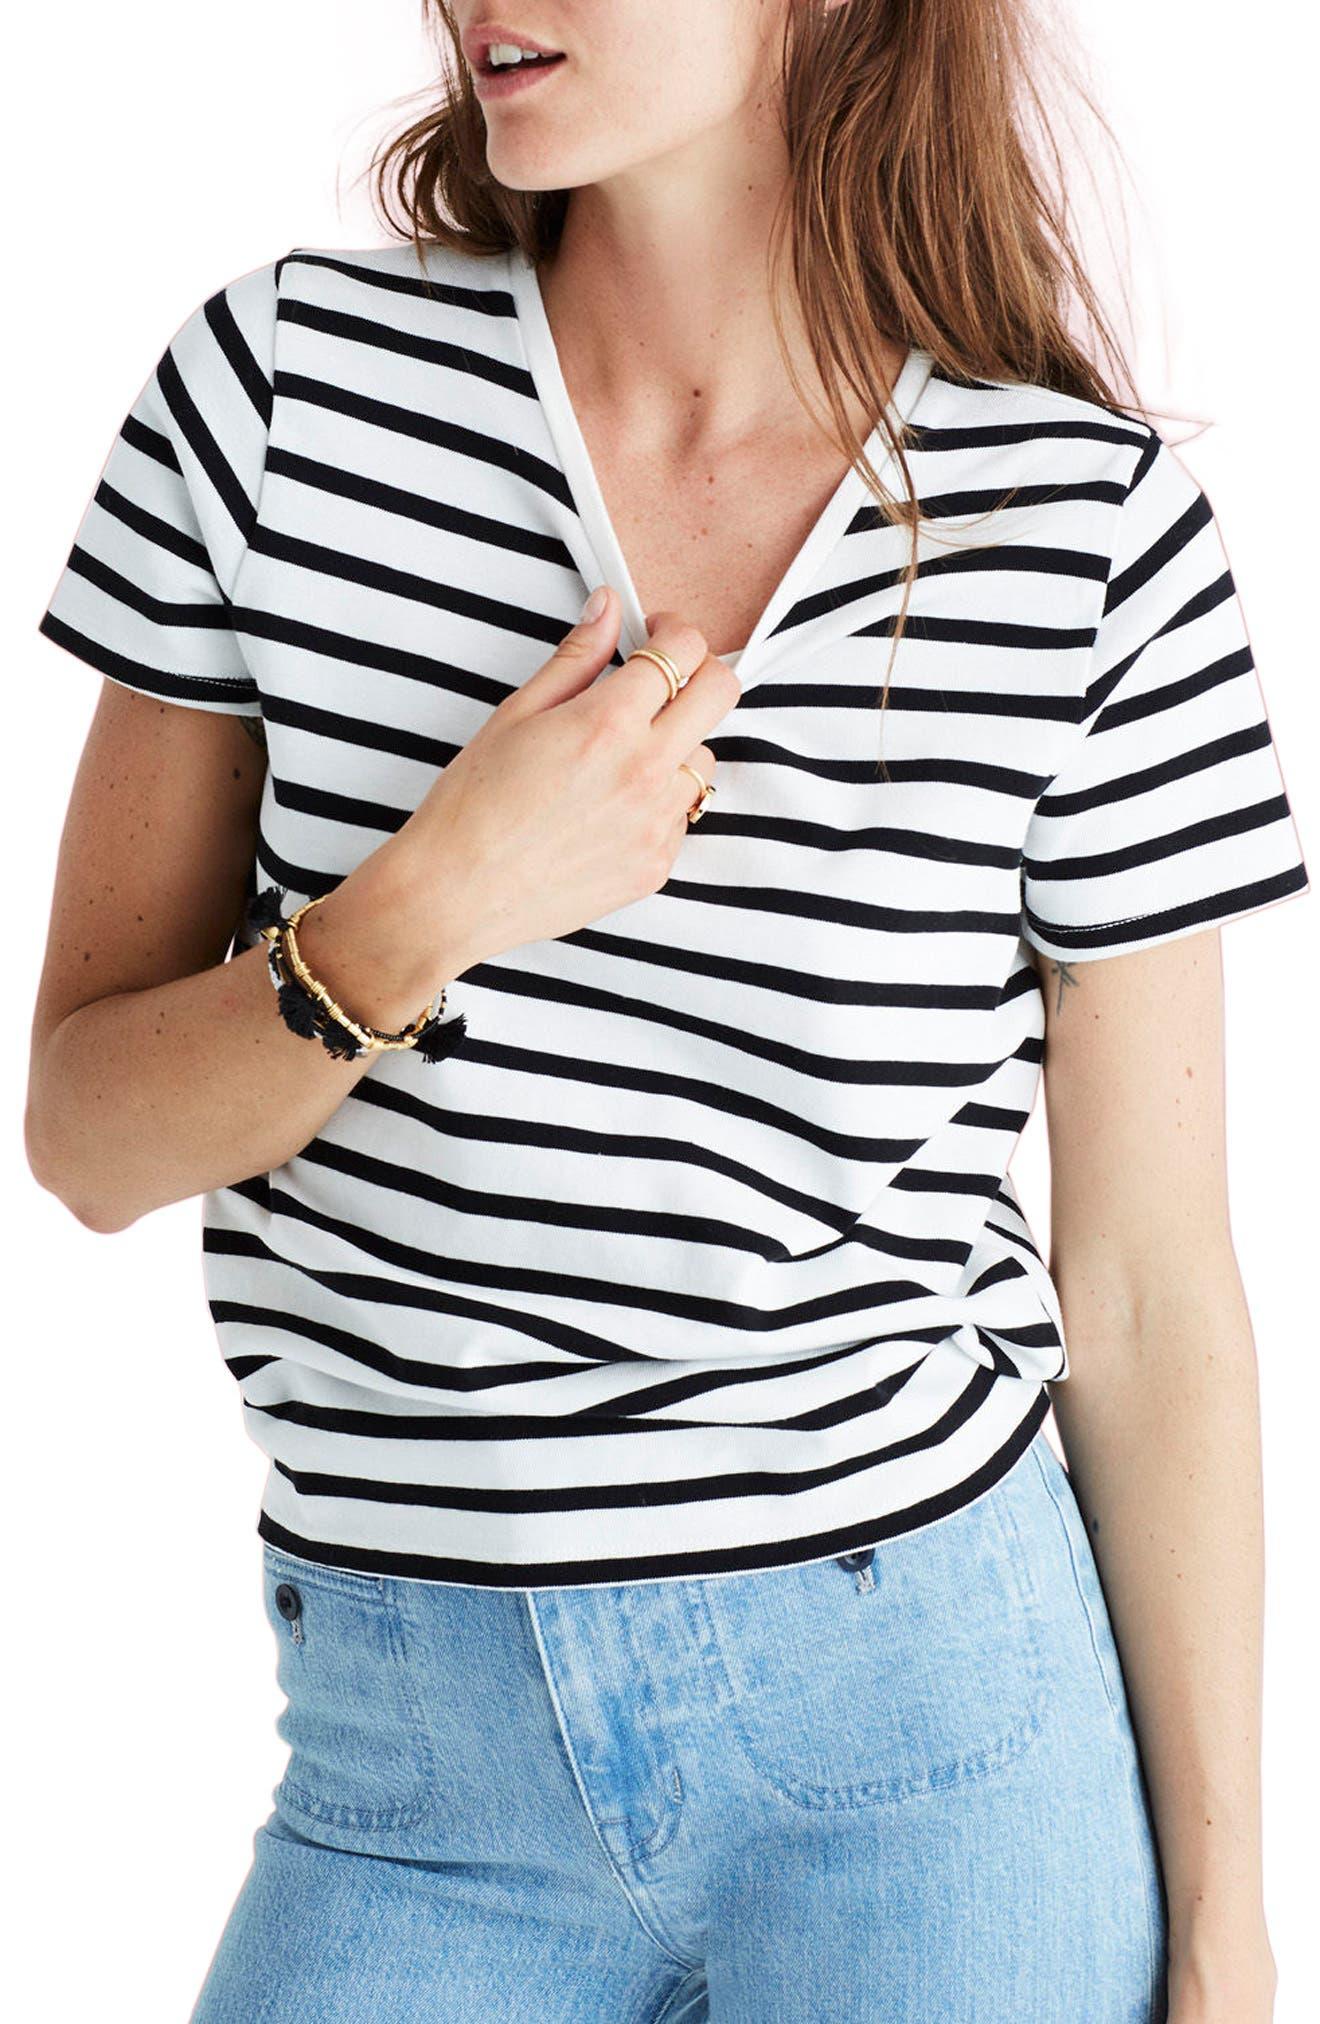 Alternate Image 1 Selected - Madewell Stripe Tie Back Tee